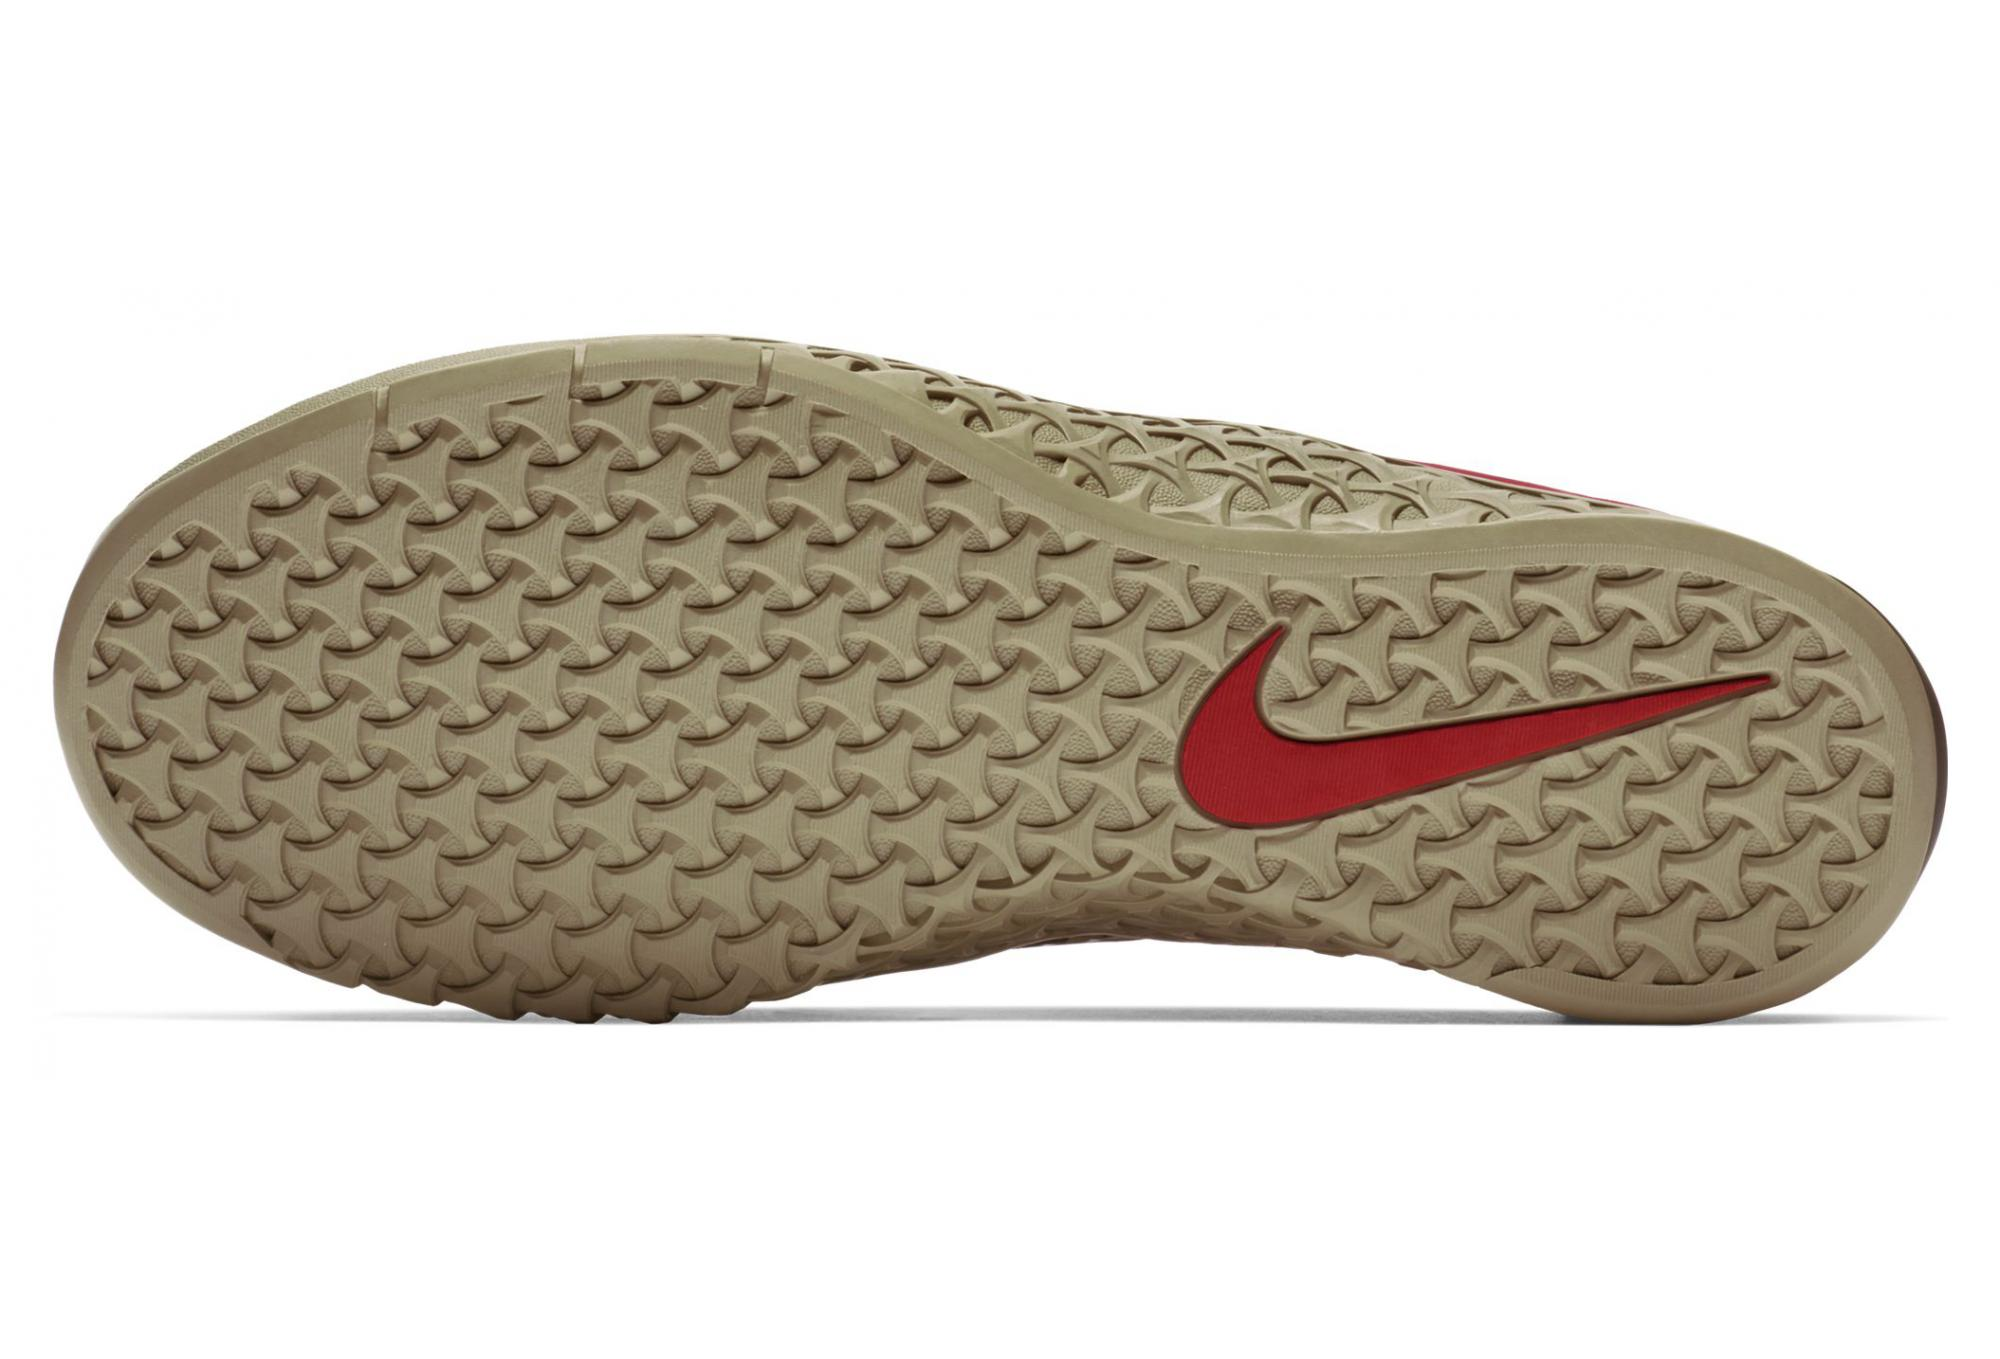 big sale 081c6 417d9 Chaussures de Cross Training Nike Metcon 4 XD Camouflage   Rouge